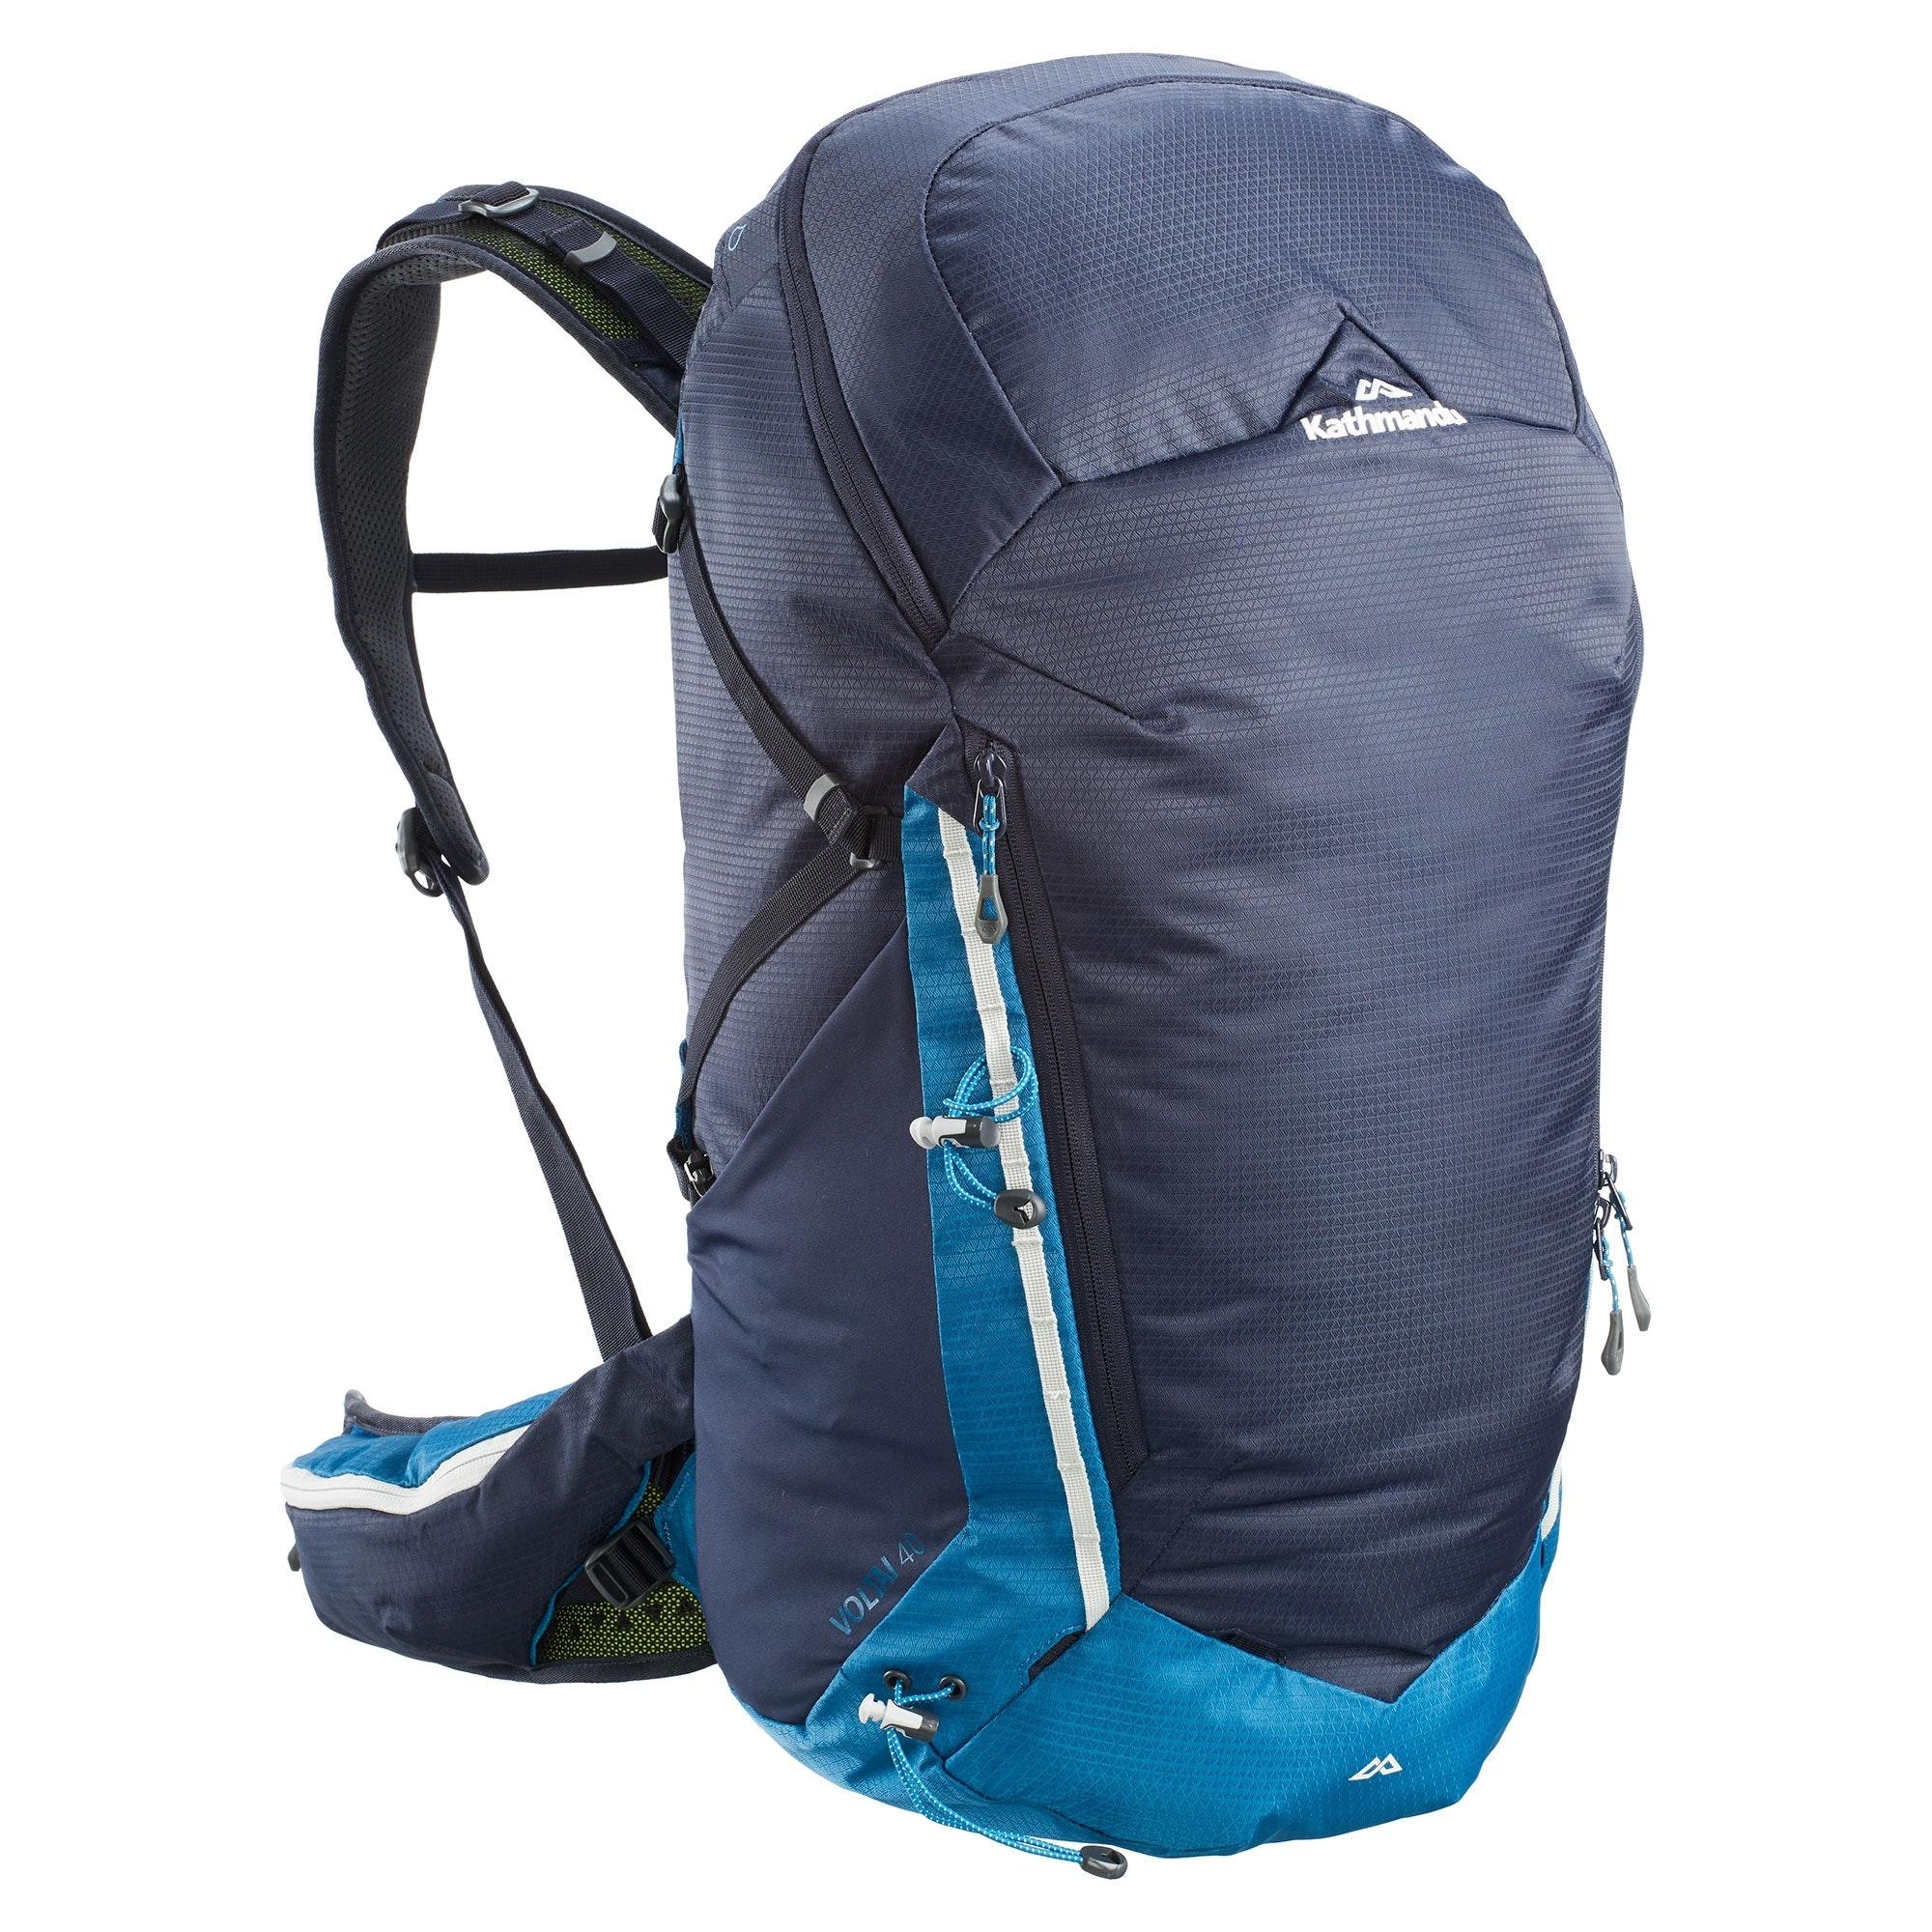 NEW-Kathmandu-Voltai-Hiking-Walking-Travel-Outdoor-Backpack-Rucksack-40L-Pack